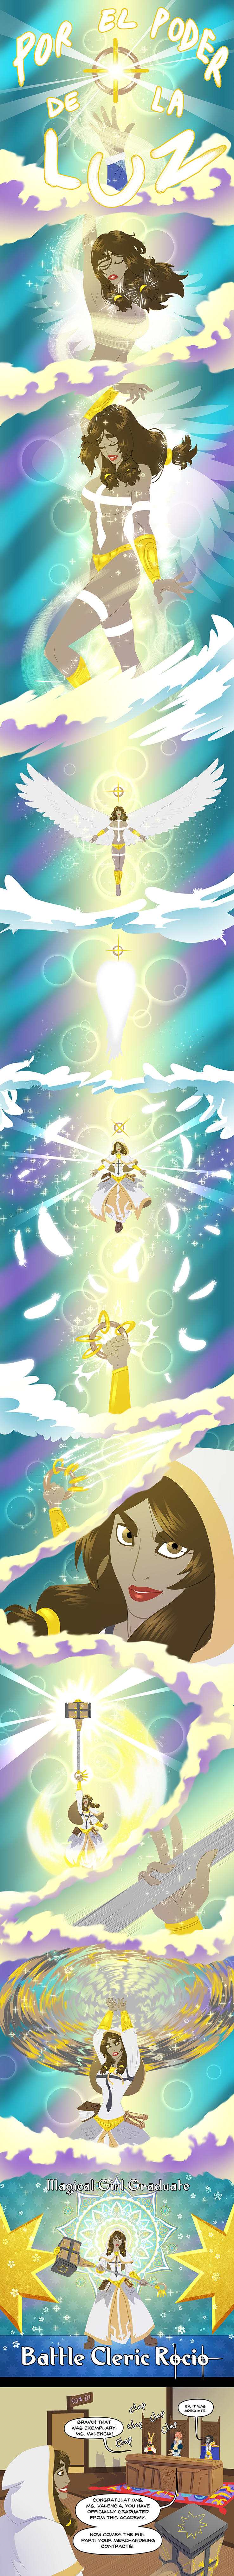 Rocio - Intro Page 1 - Magical Girl Transformation by pyrasterran